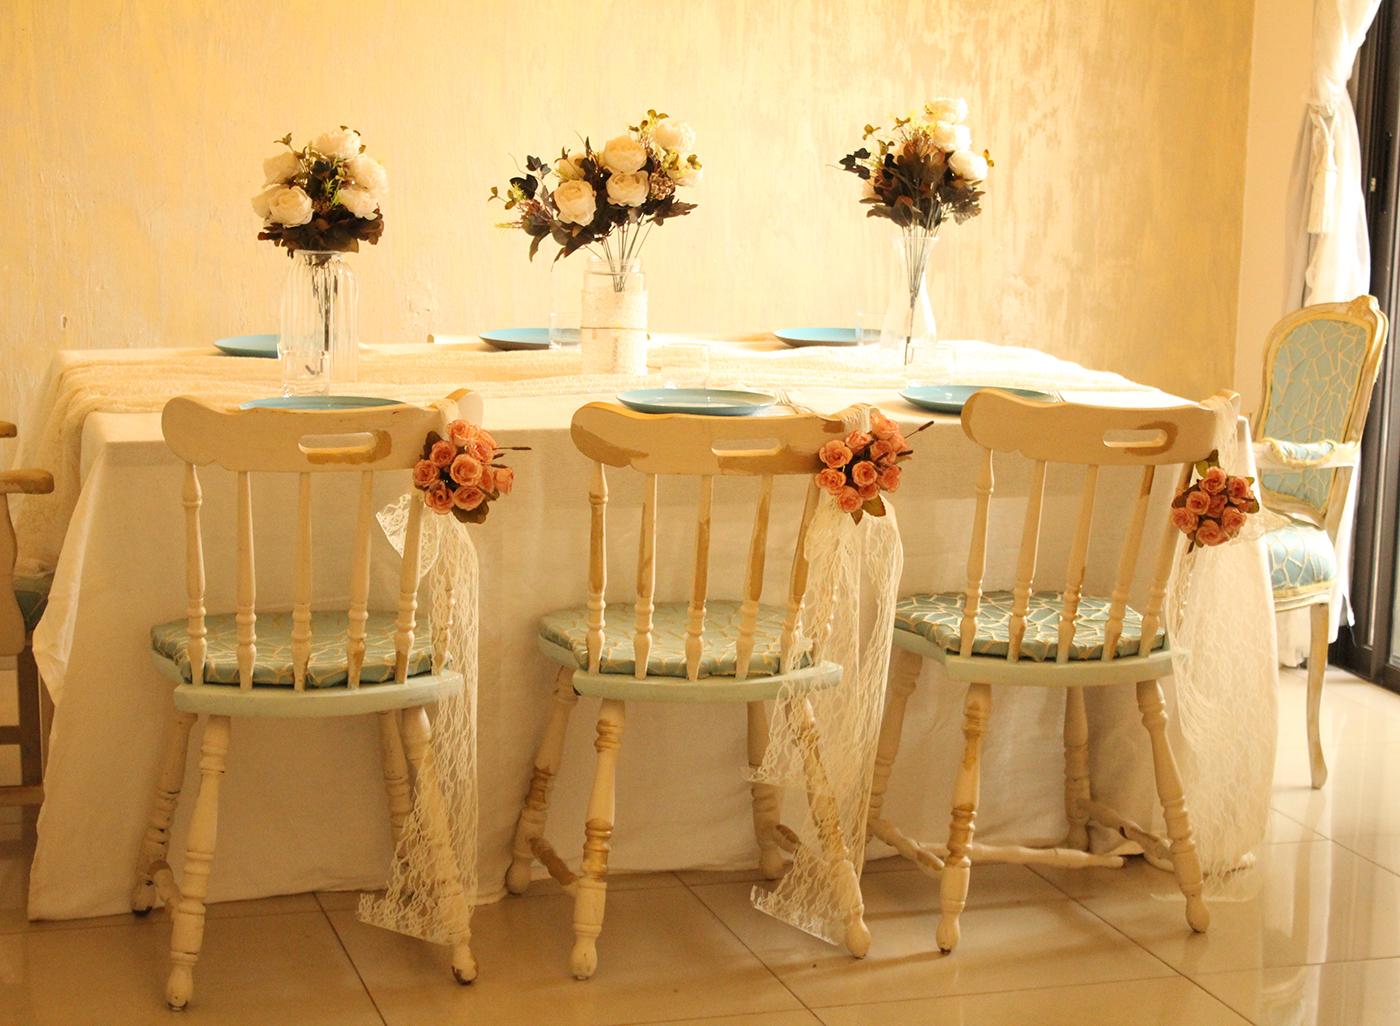 IMG 8100 - חידוש כסאות לפינת אוכל בסלון